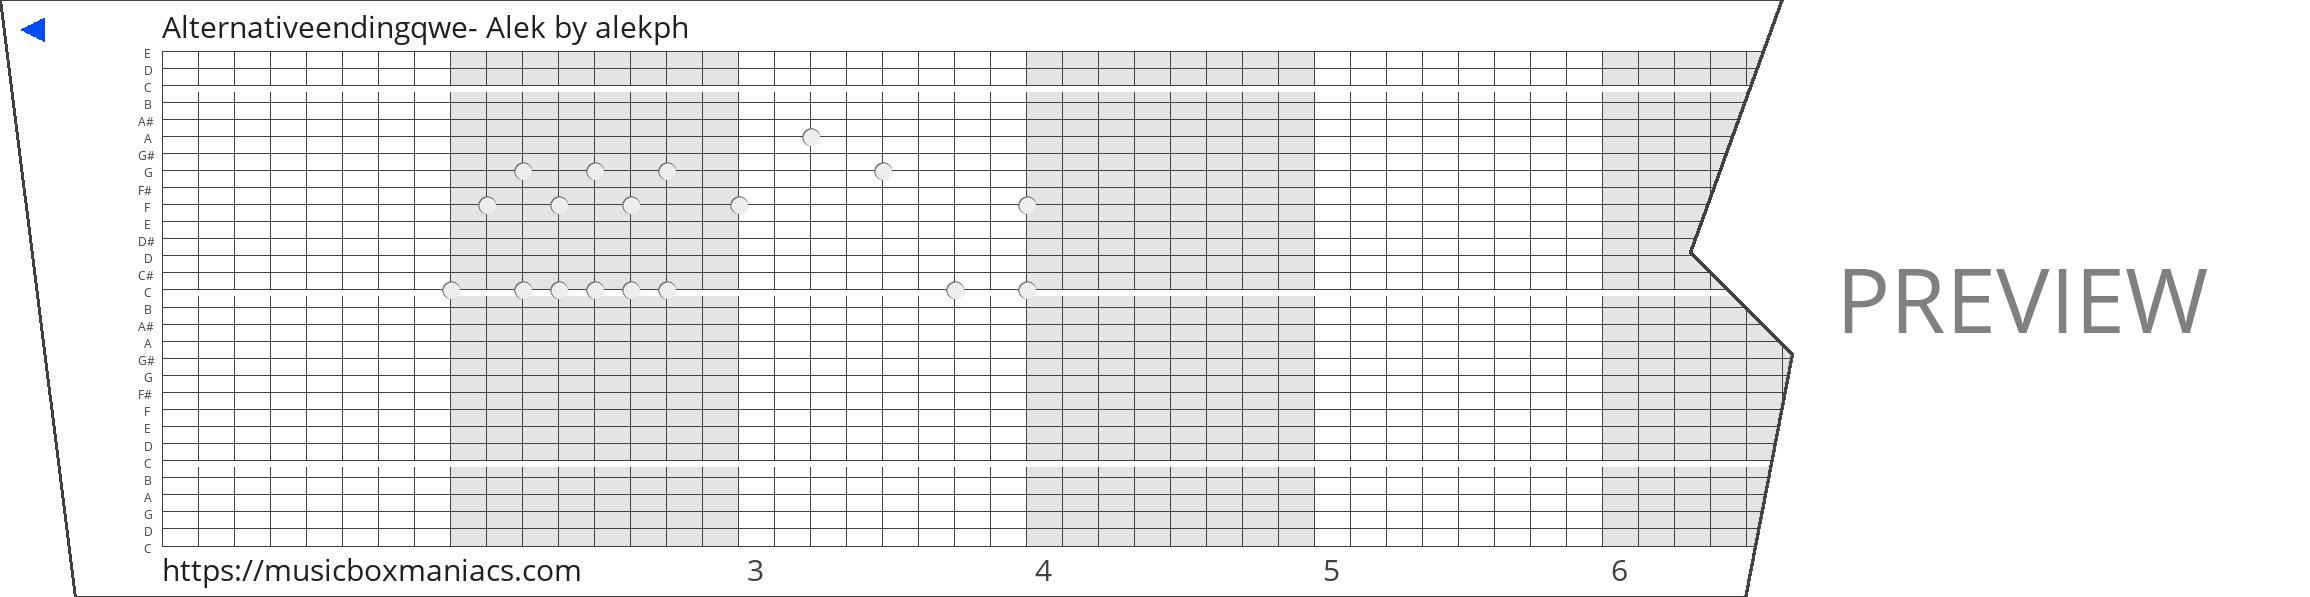 Alternativeendingqwe- Alek 30 note music box paper strip